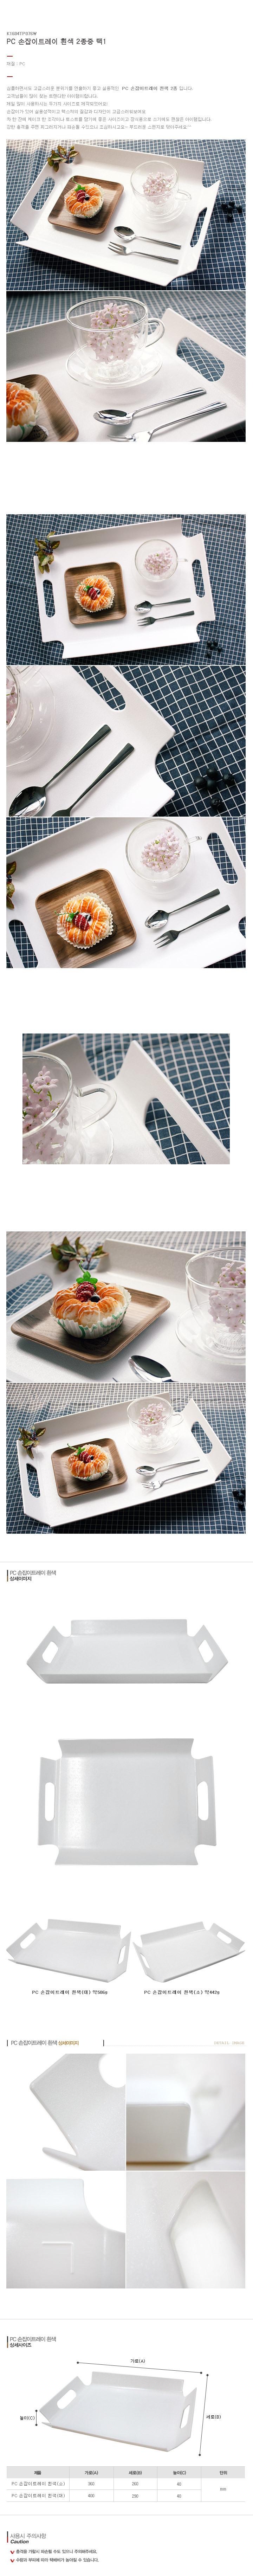 PC 손잡이트레이 흰색 갈색 블랙 6종중 택1 - 토다스, 7,800원, 주방소품, 쟁반/트레이